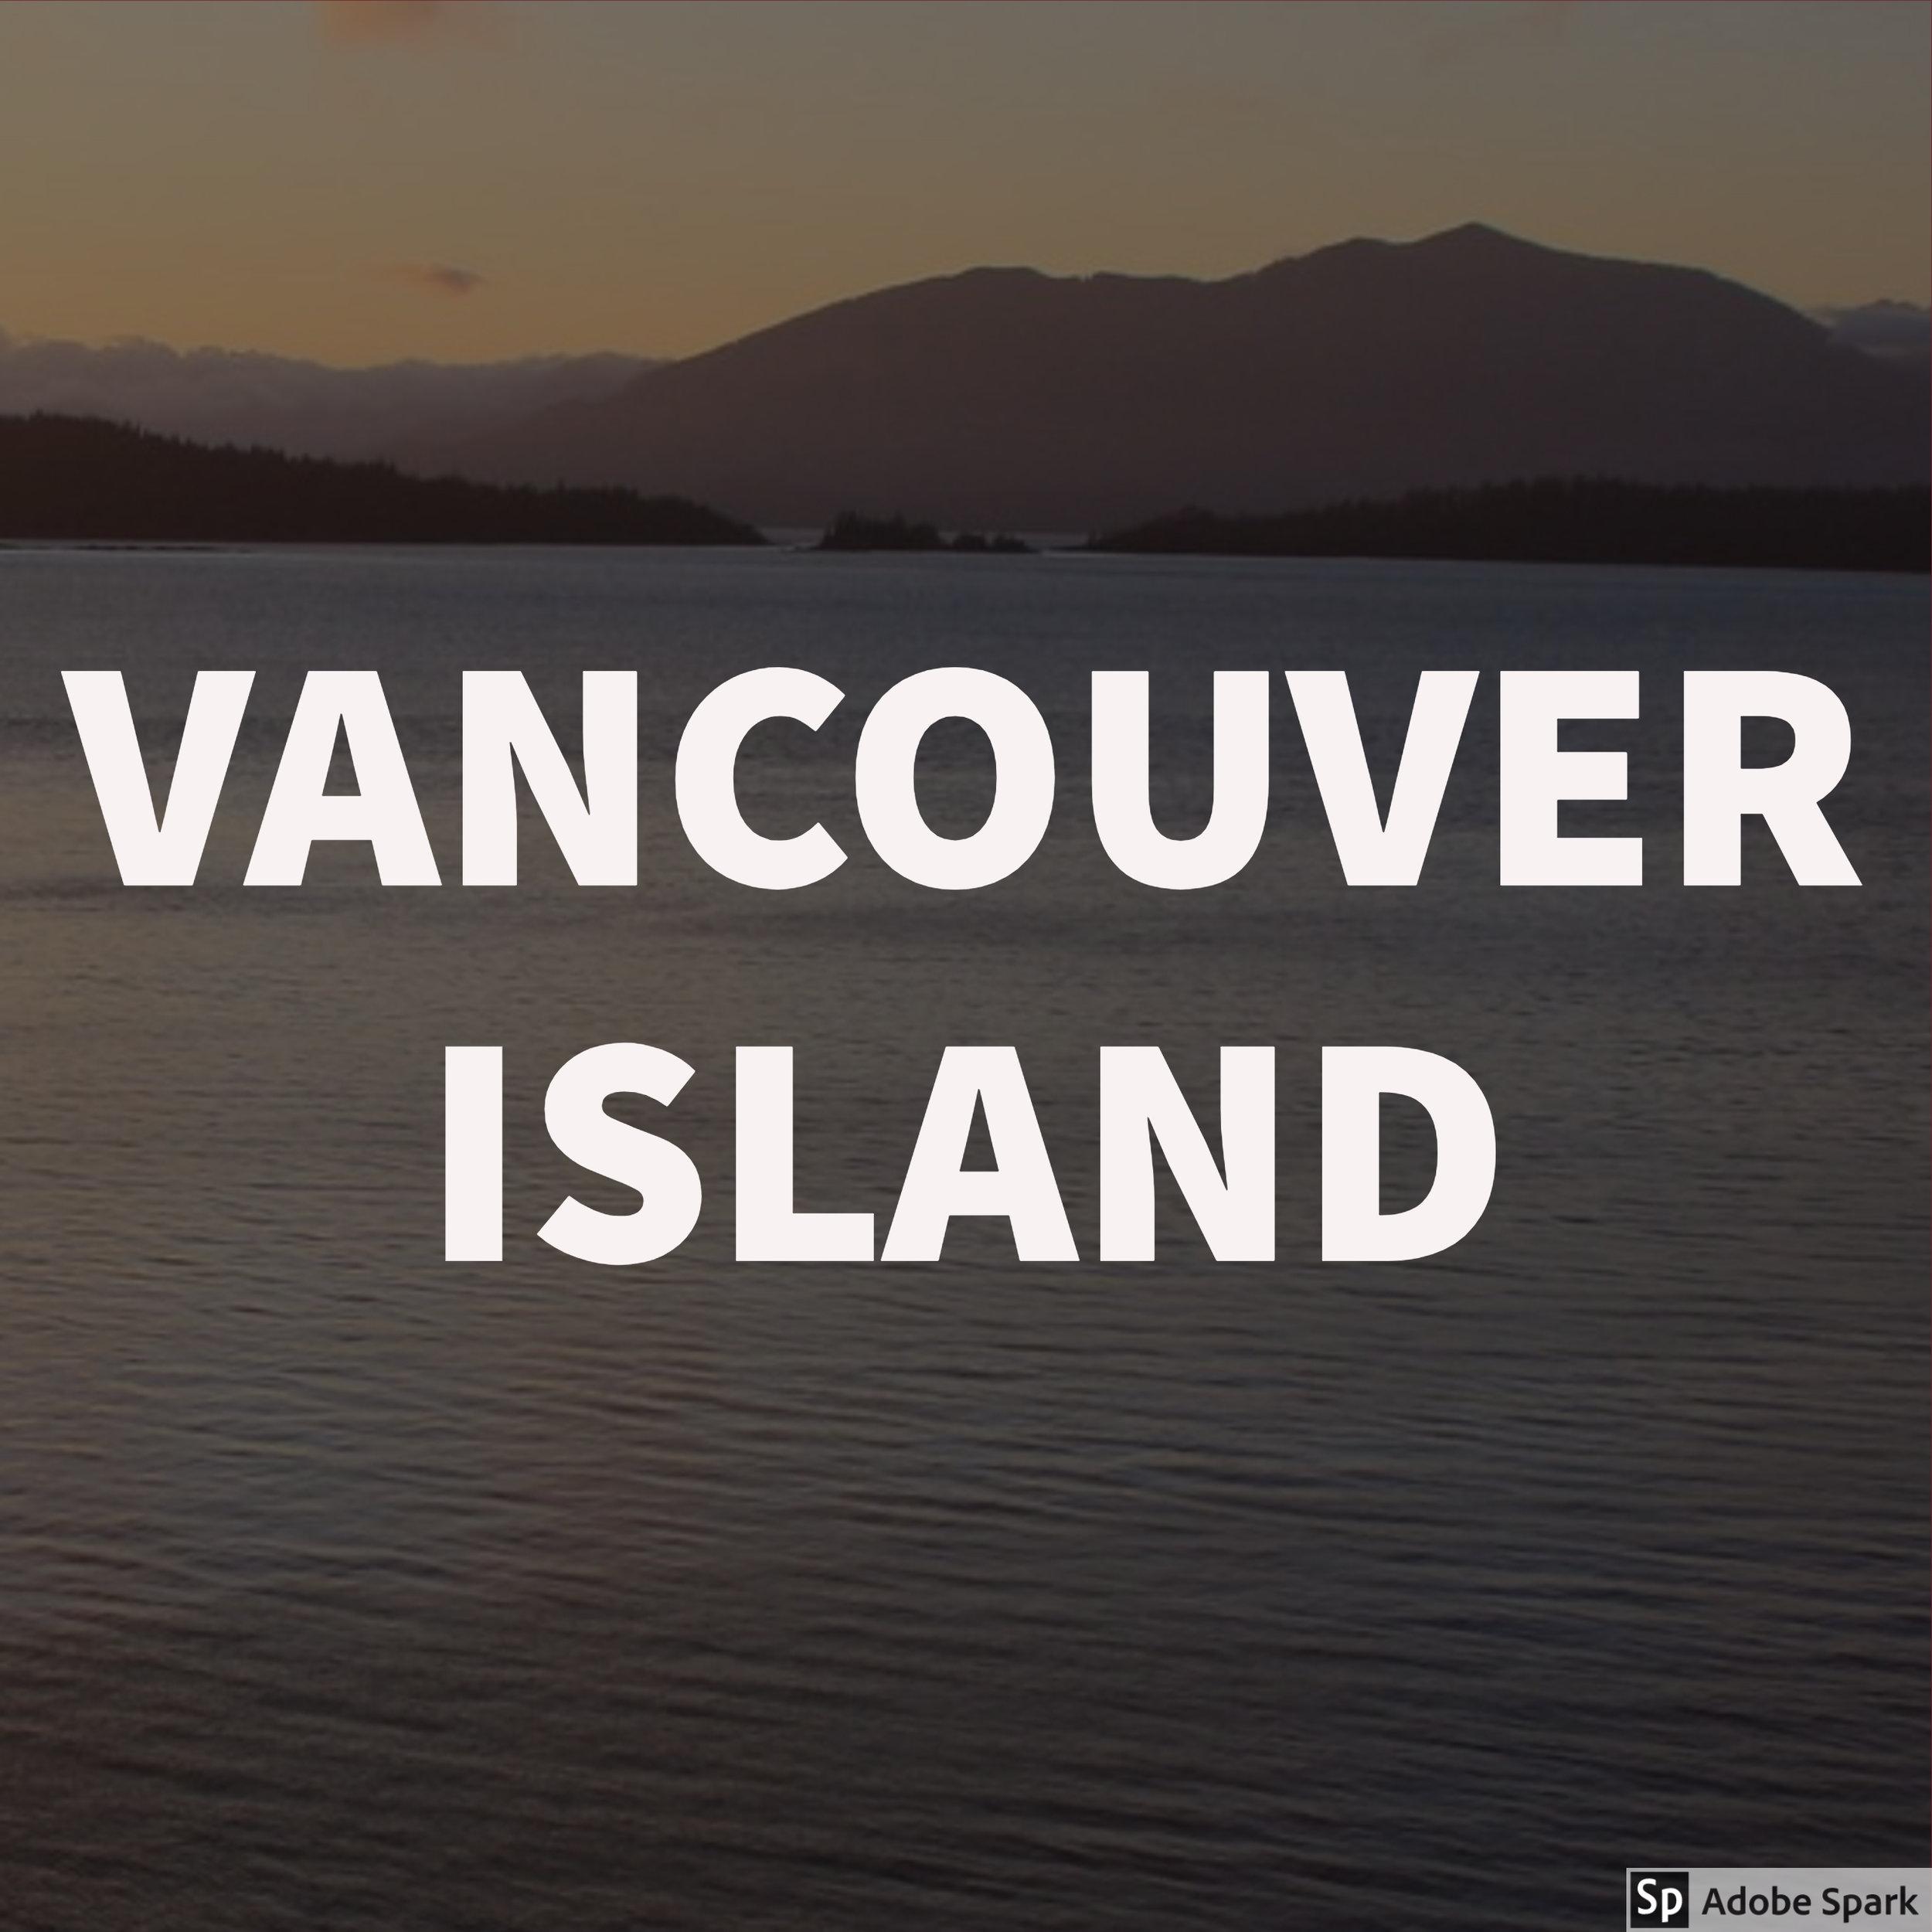 VancouverIsland.jpg